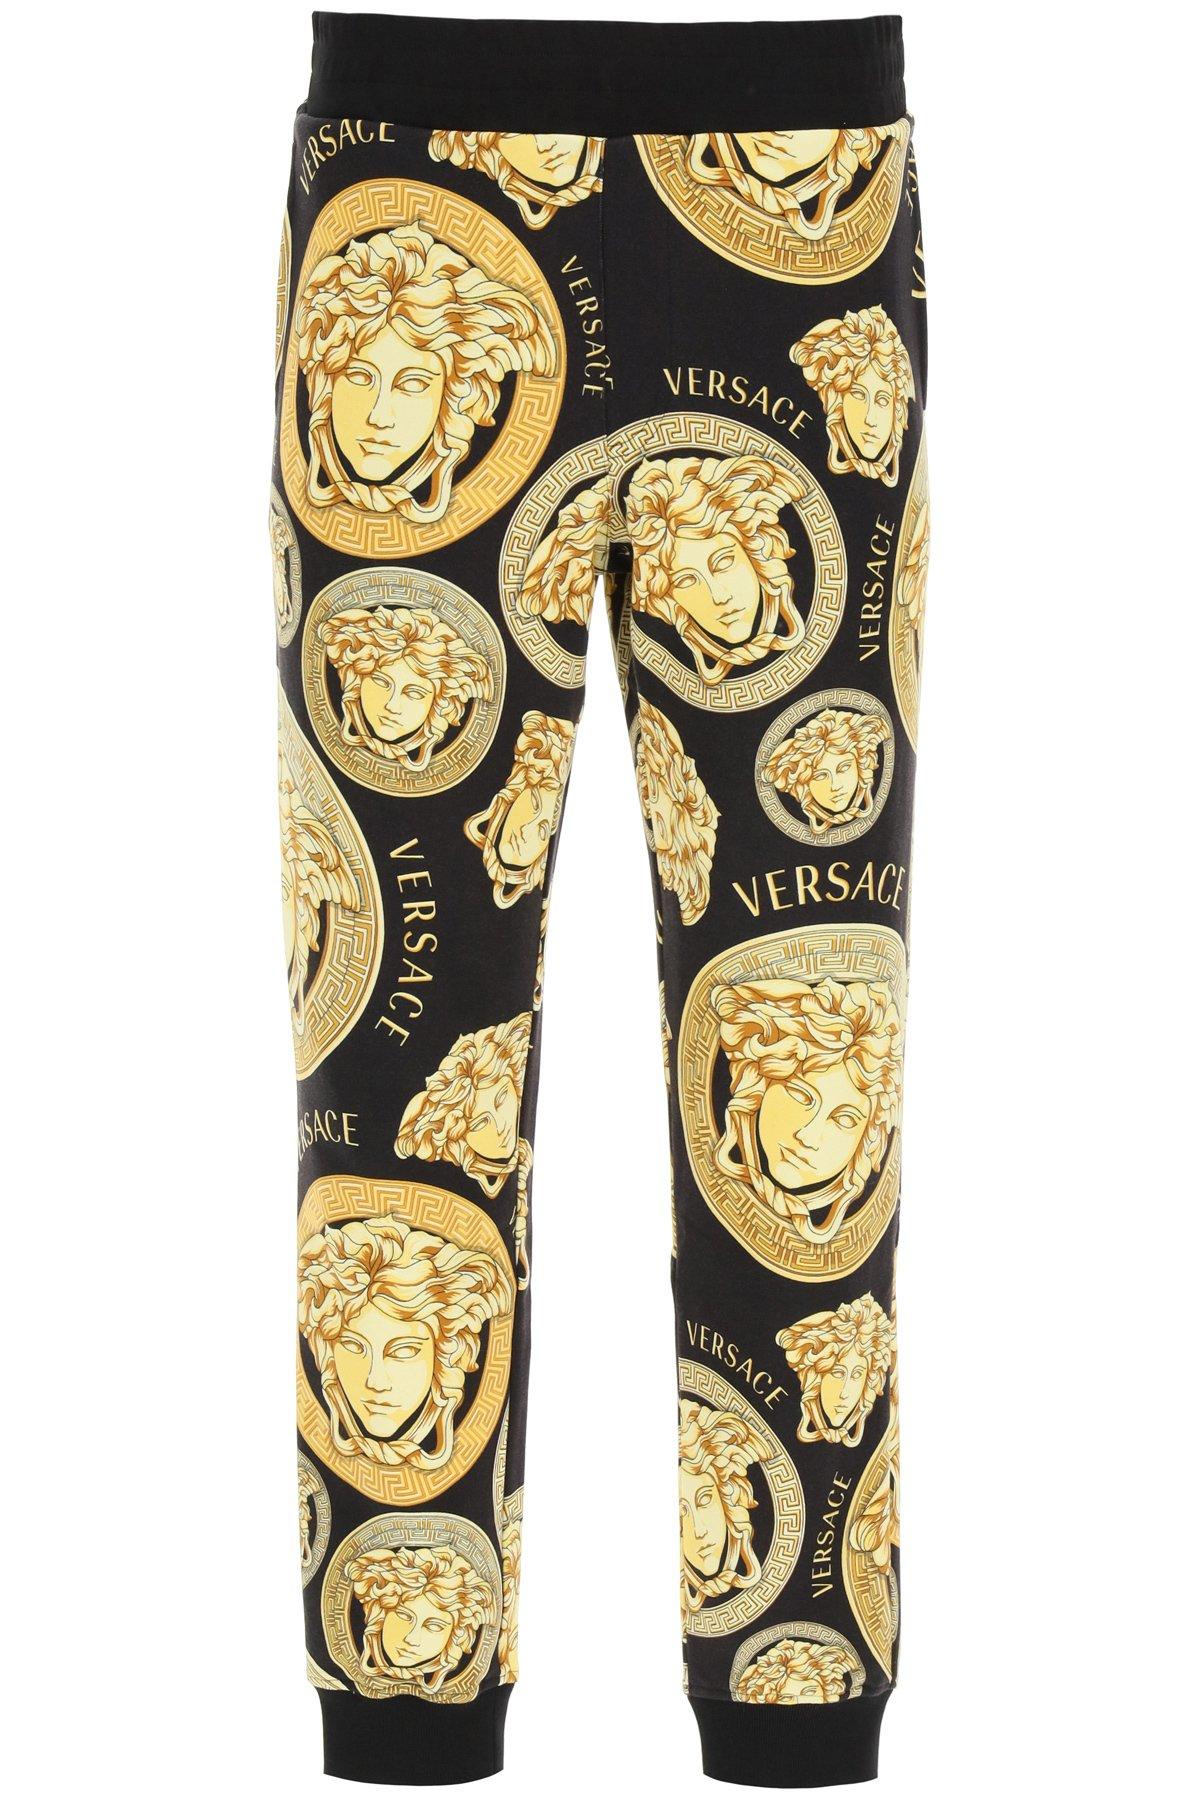 Versace pantaloni jogging stampa medusa amplified